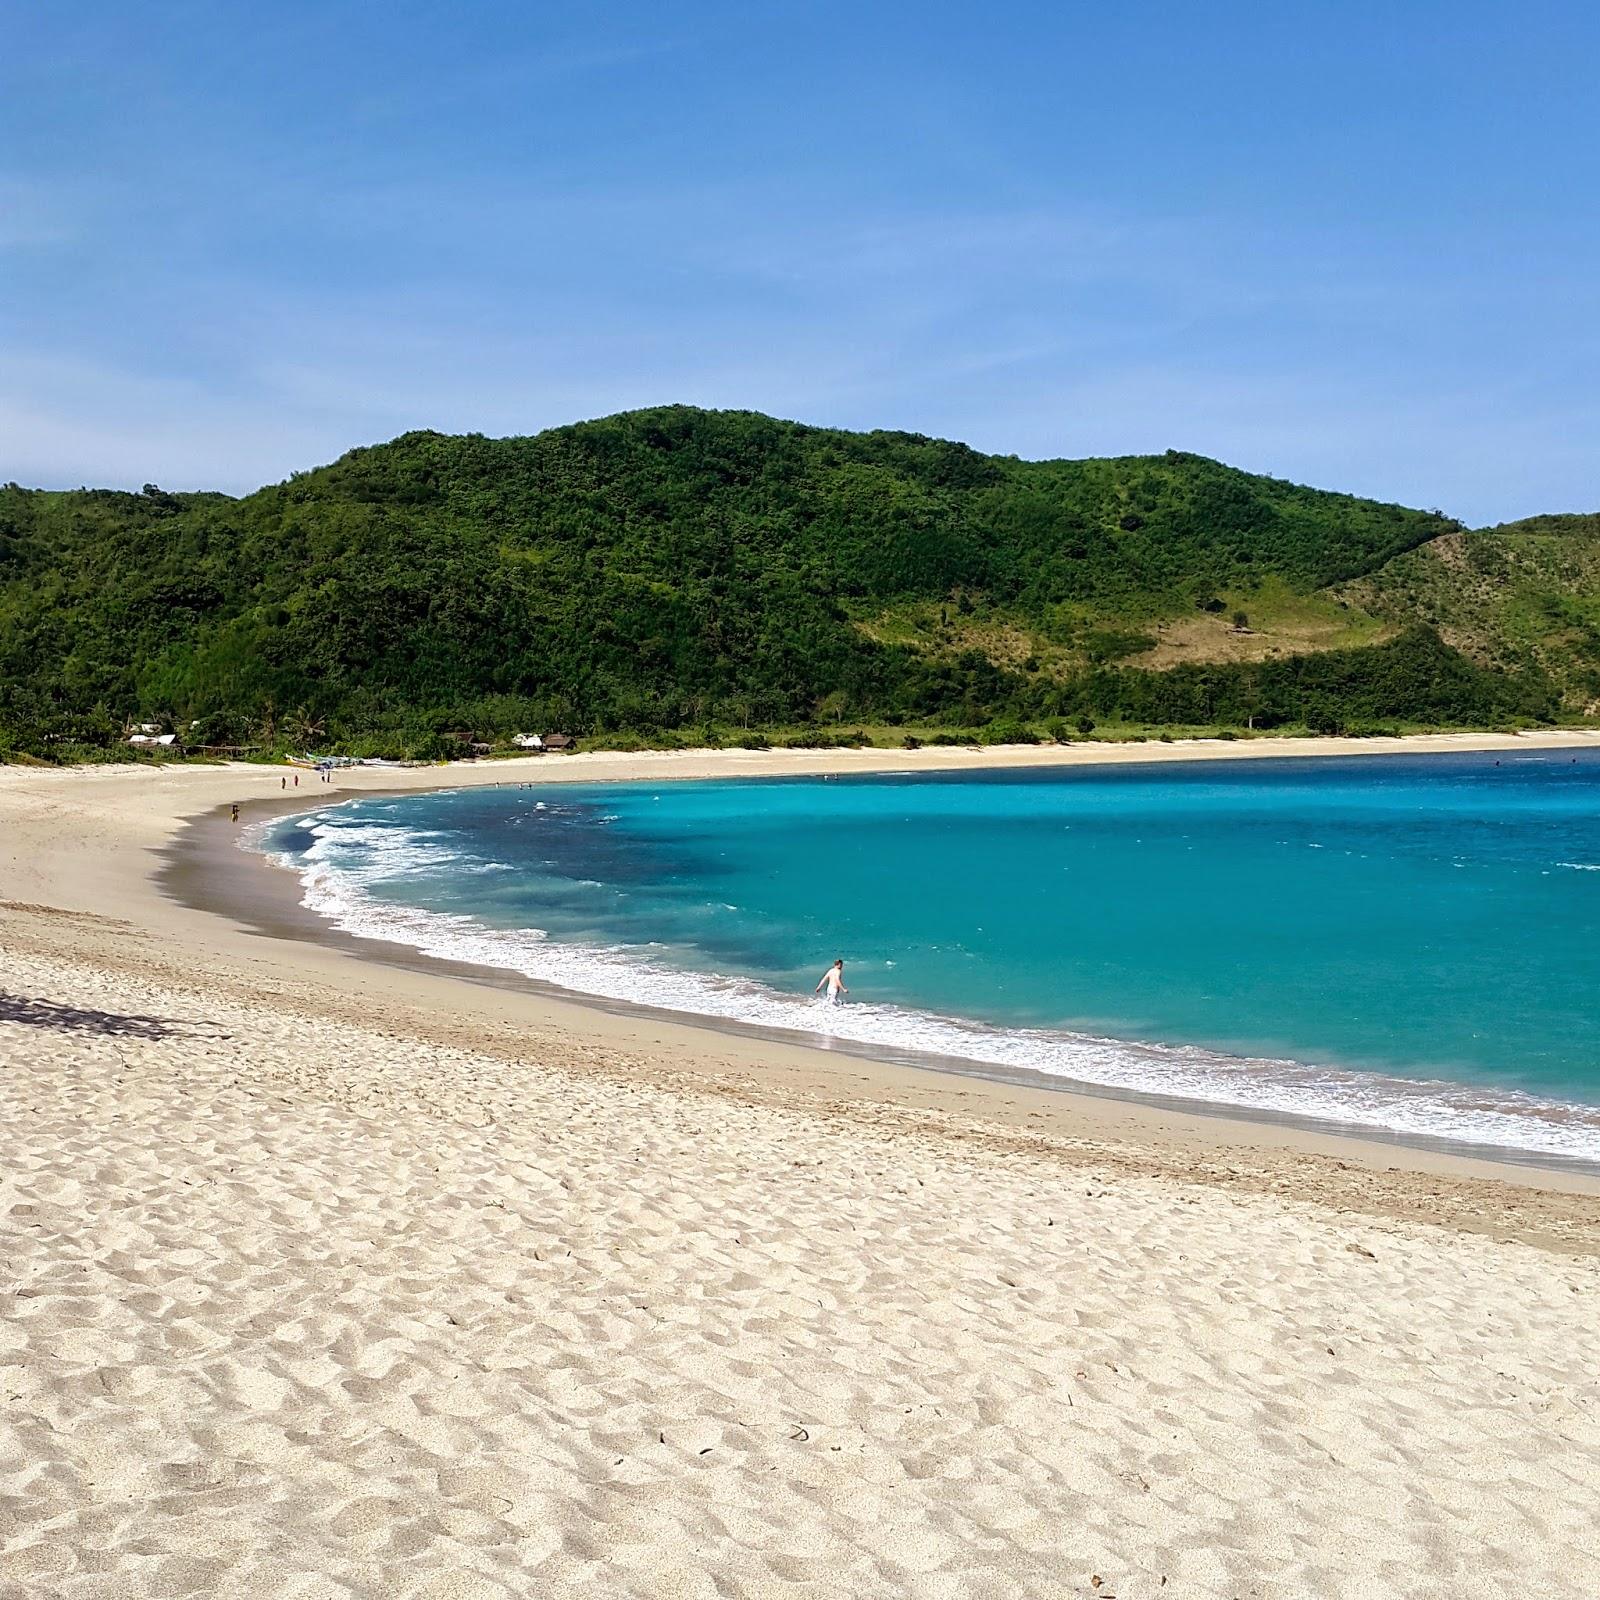 Mawi Beach Lombok Island